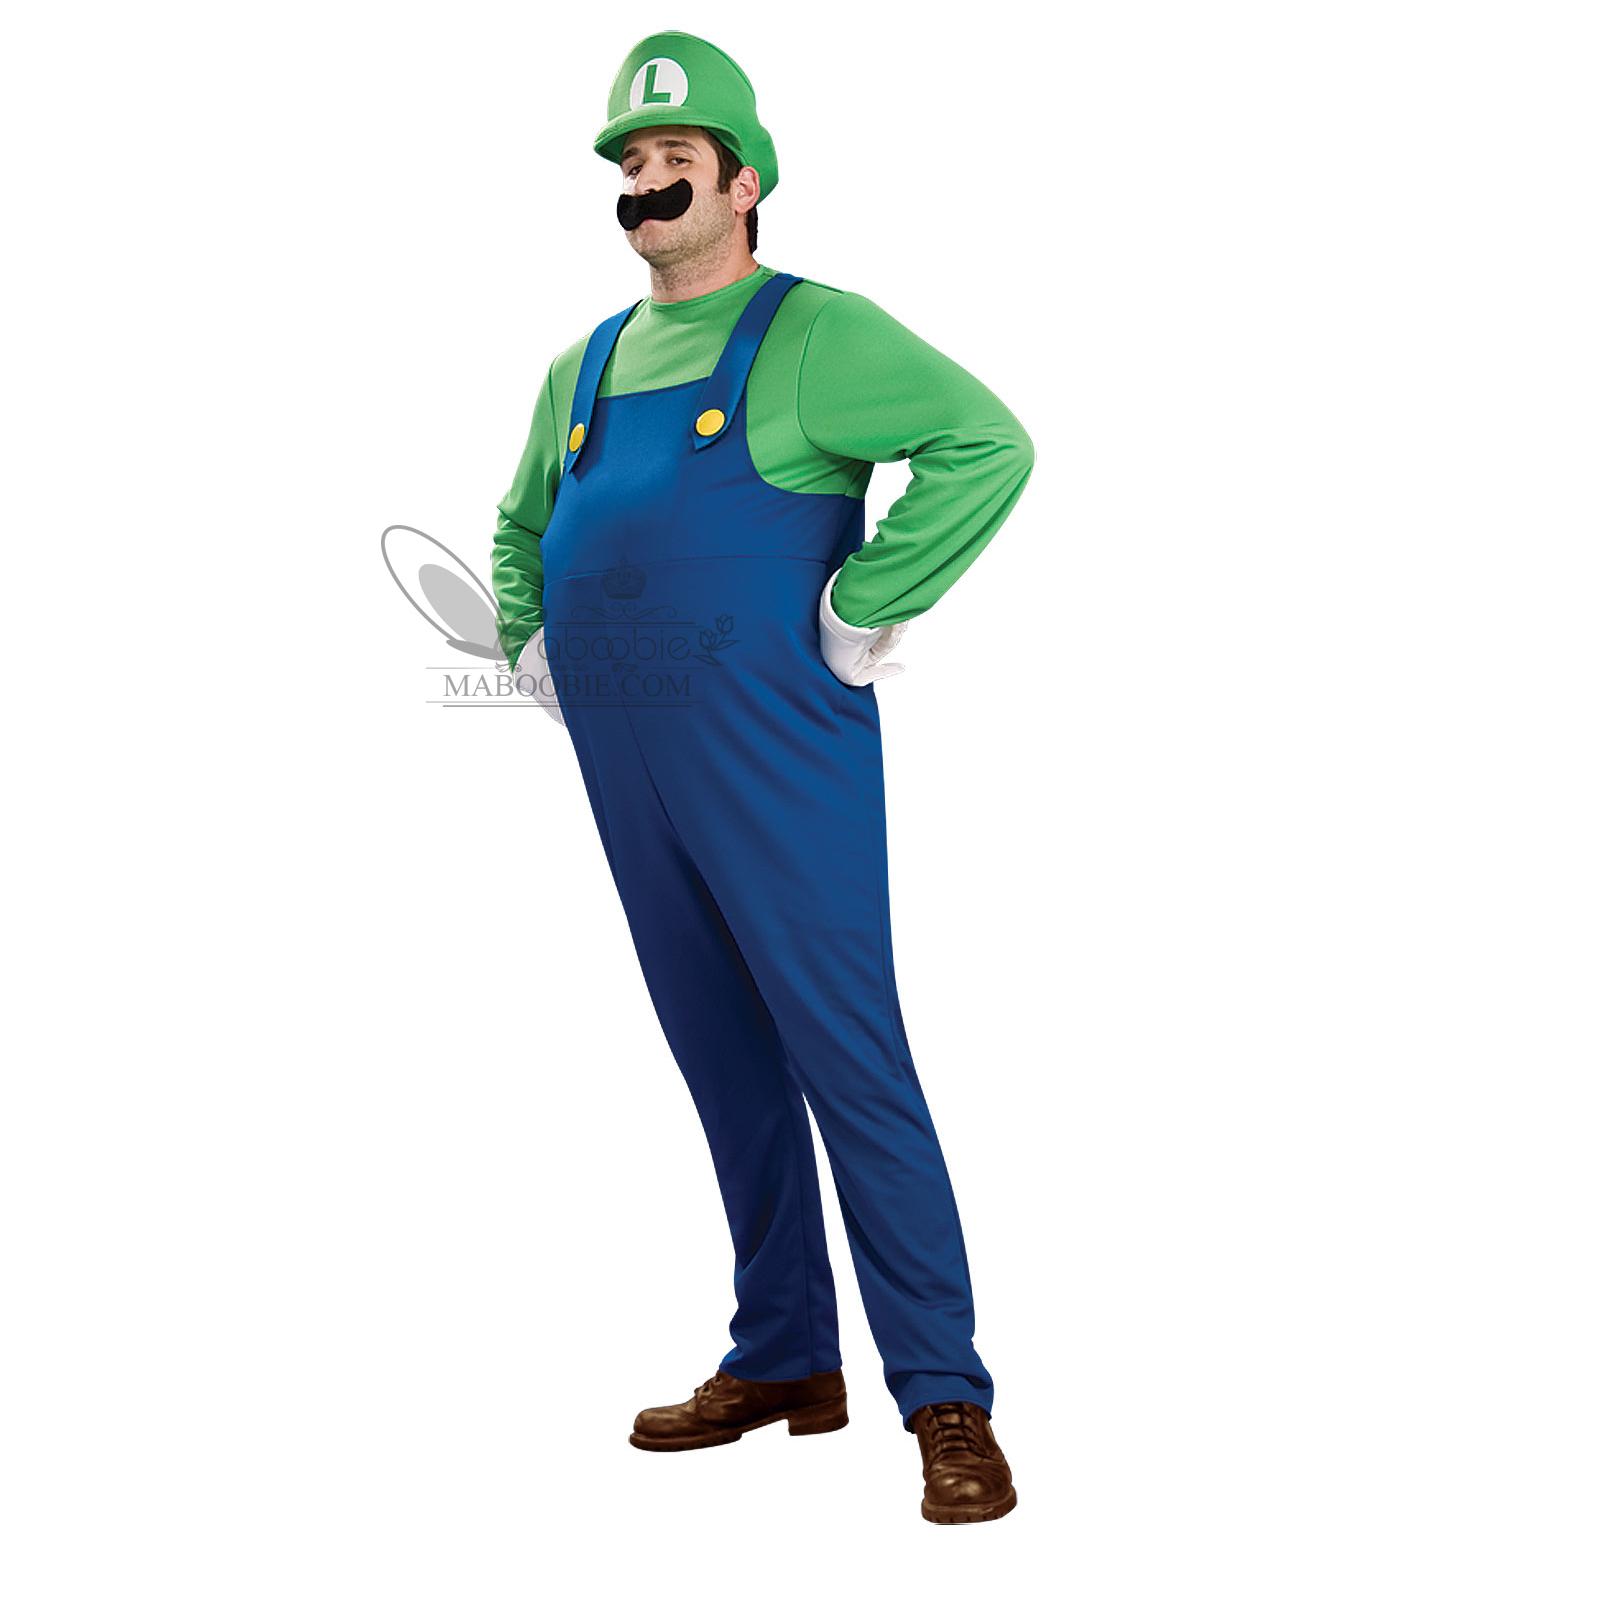 costume de deguisement complet super mario luigi toad bros femme homme s m l ebay. Black Bedroom Furniture Sets. Home Design Ideas